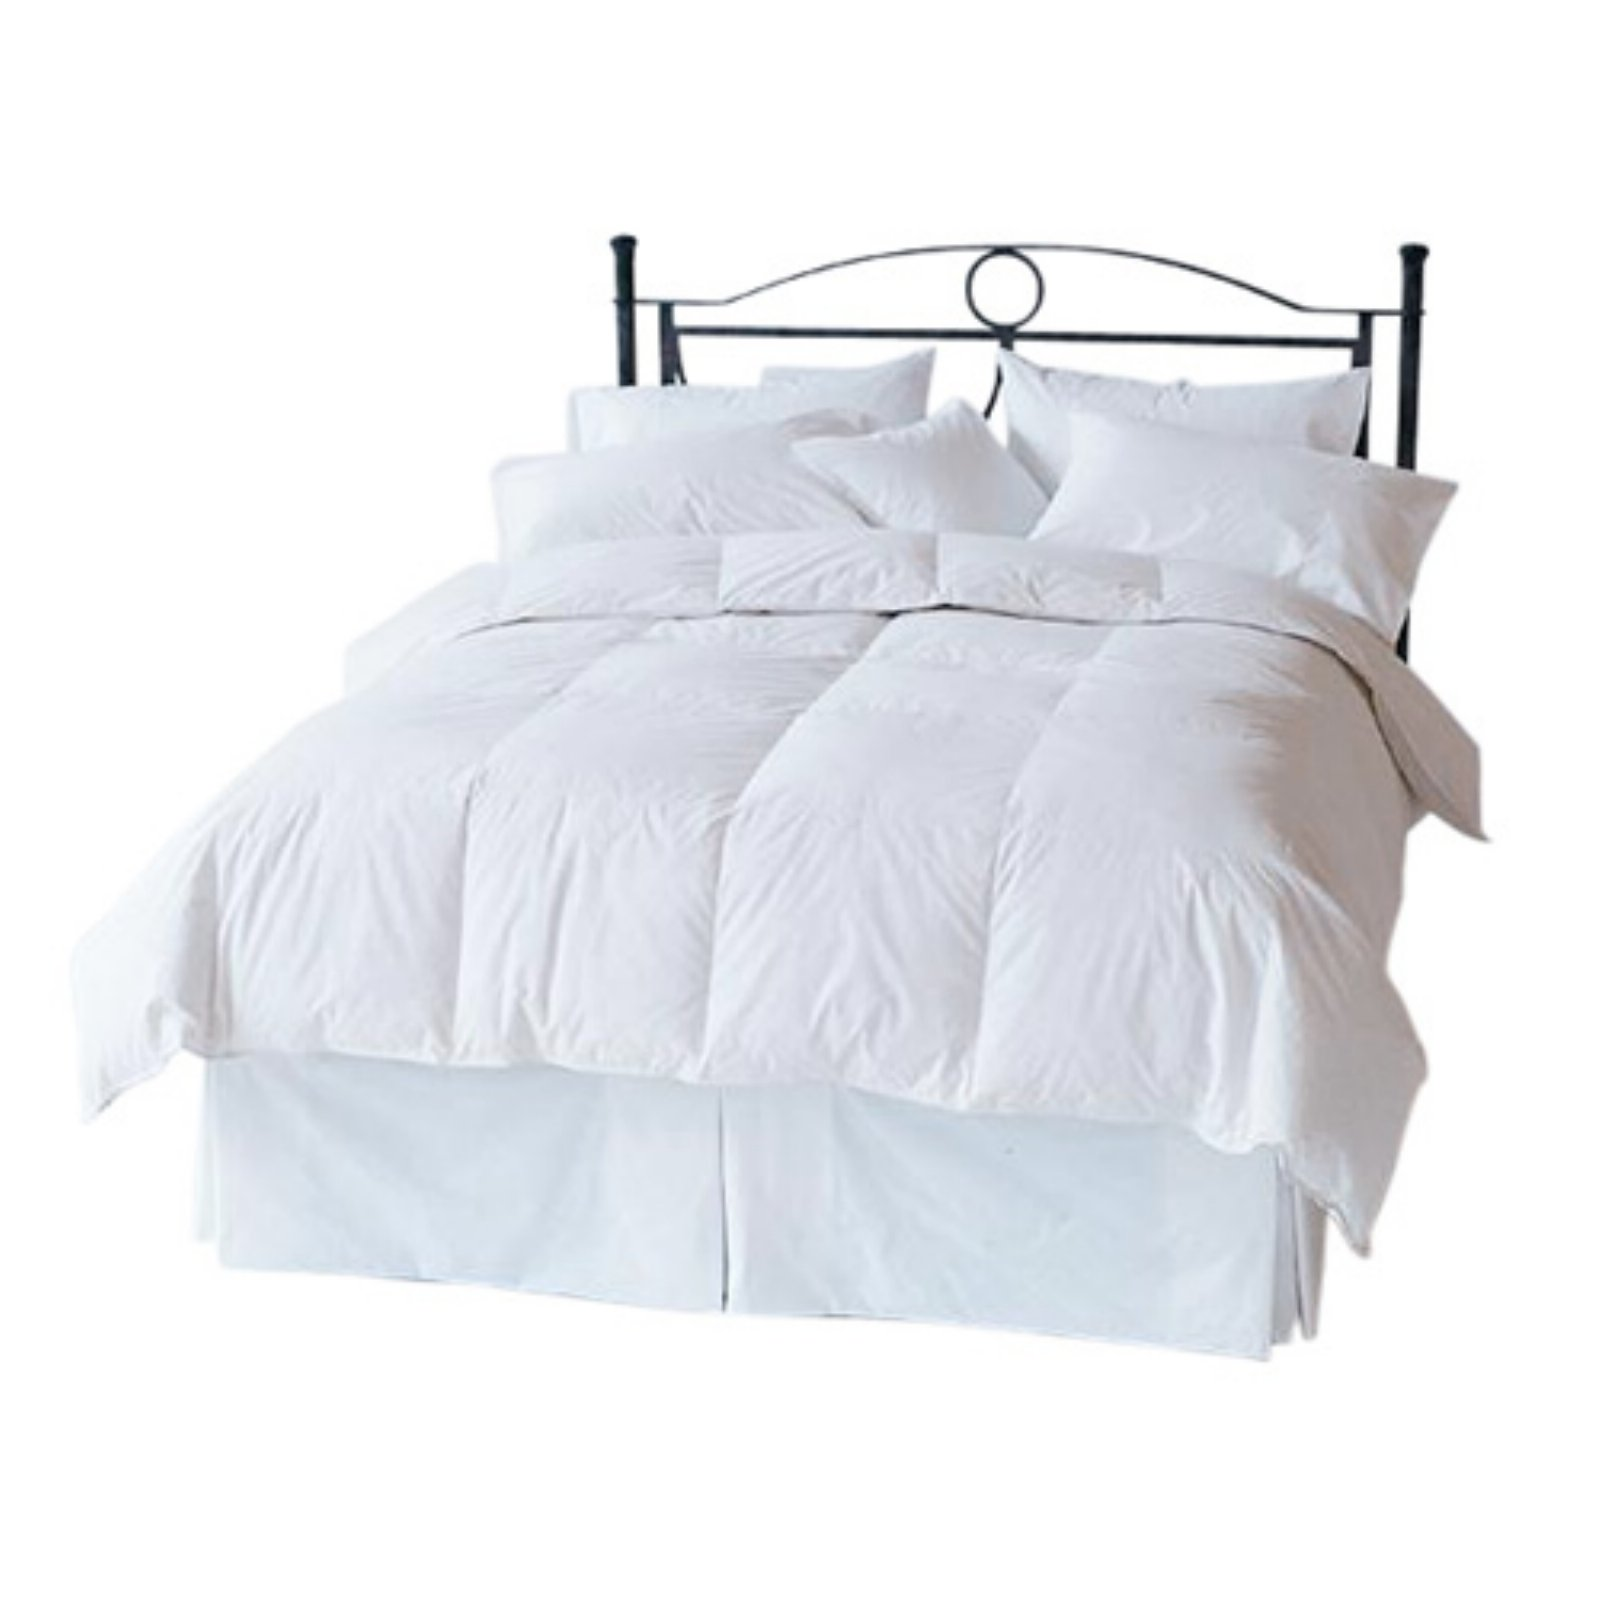 Daniadown Pinnacle Down Comforter - Winter Weight